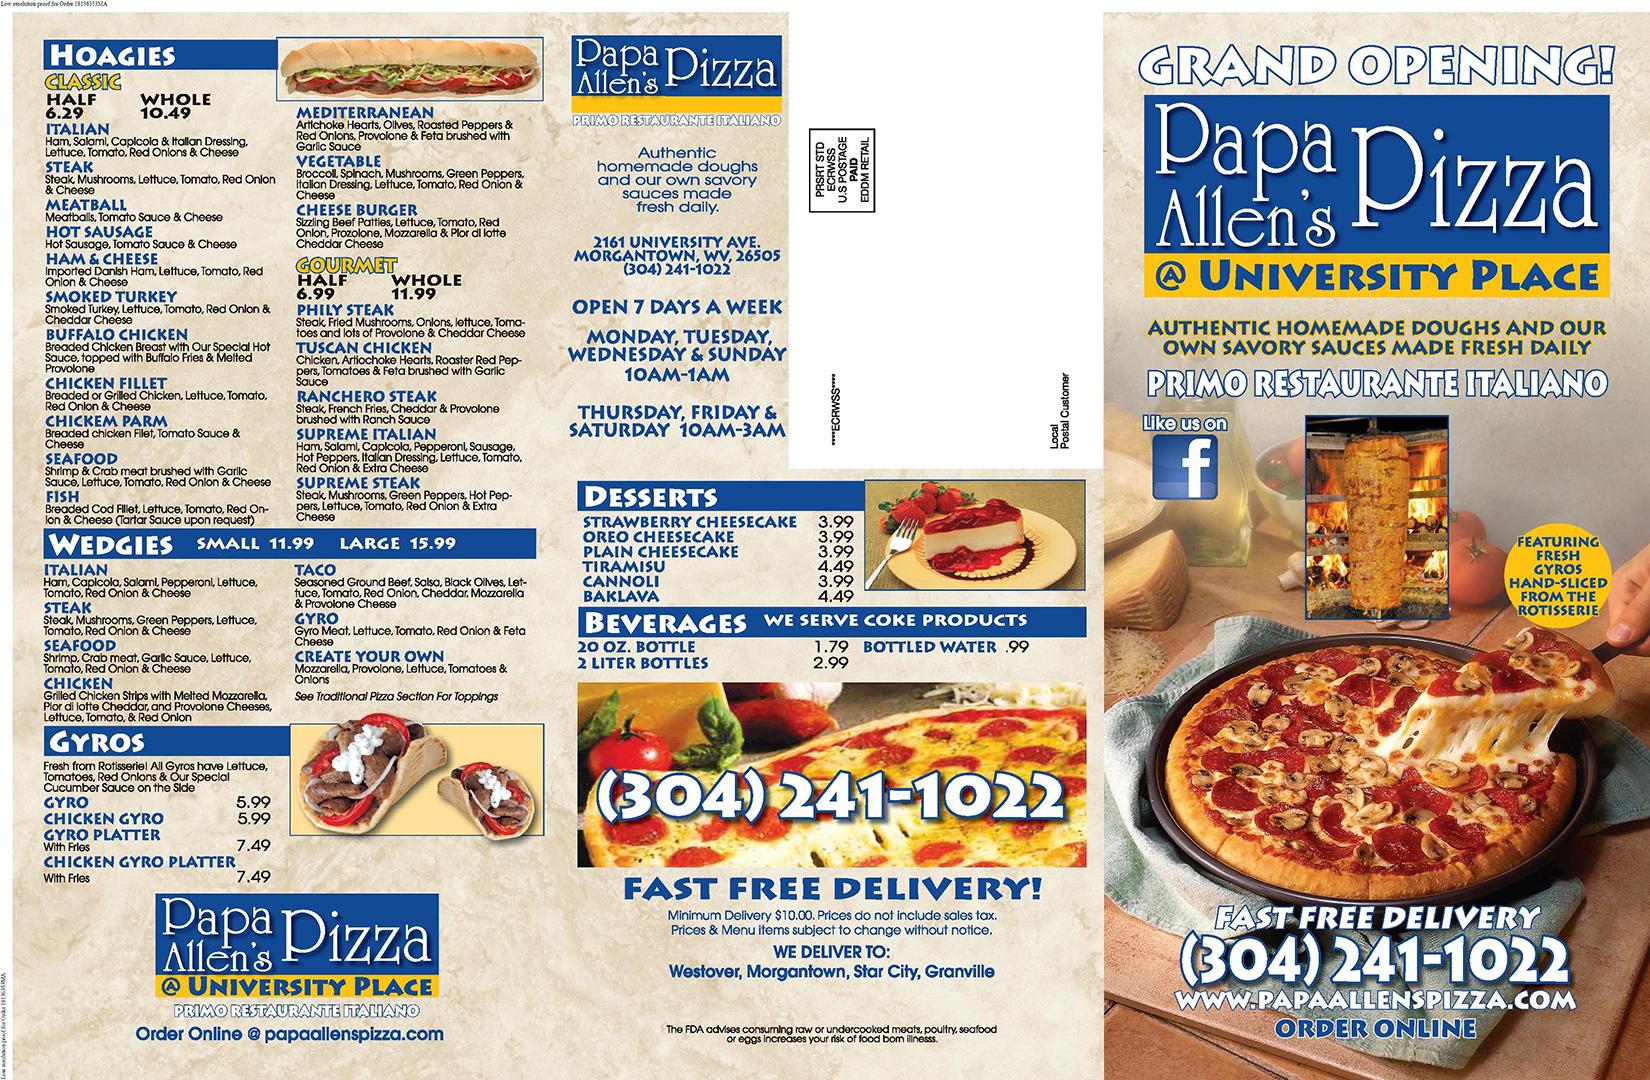 Napoli's Pizza & Restaurant - Allen, TX |Pizza Allen